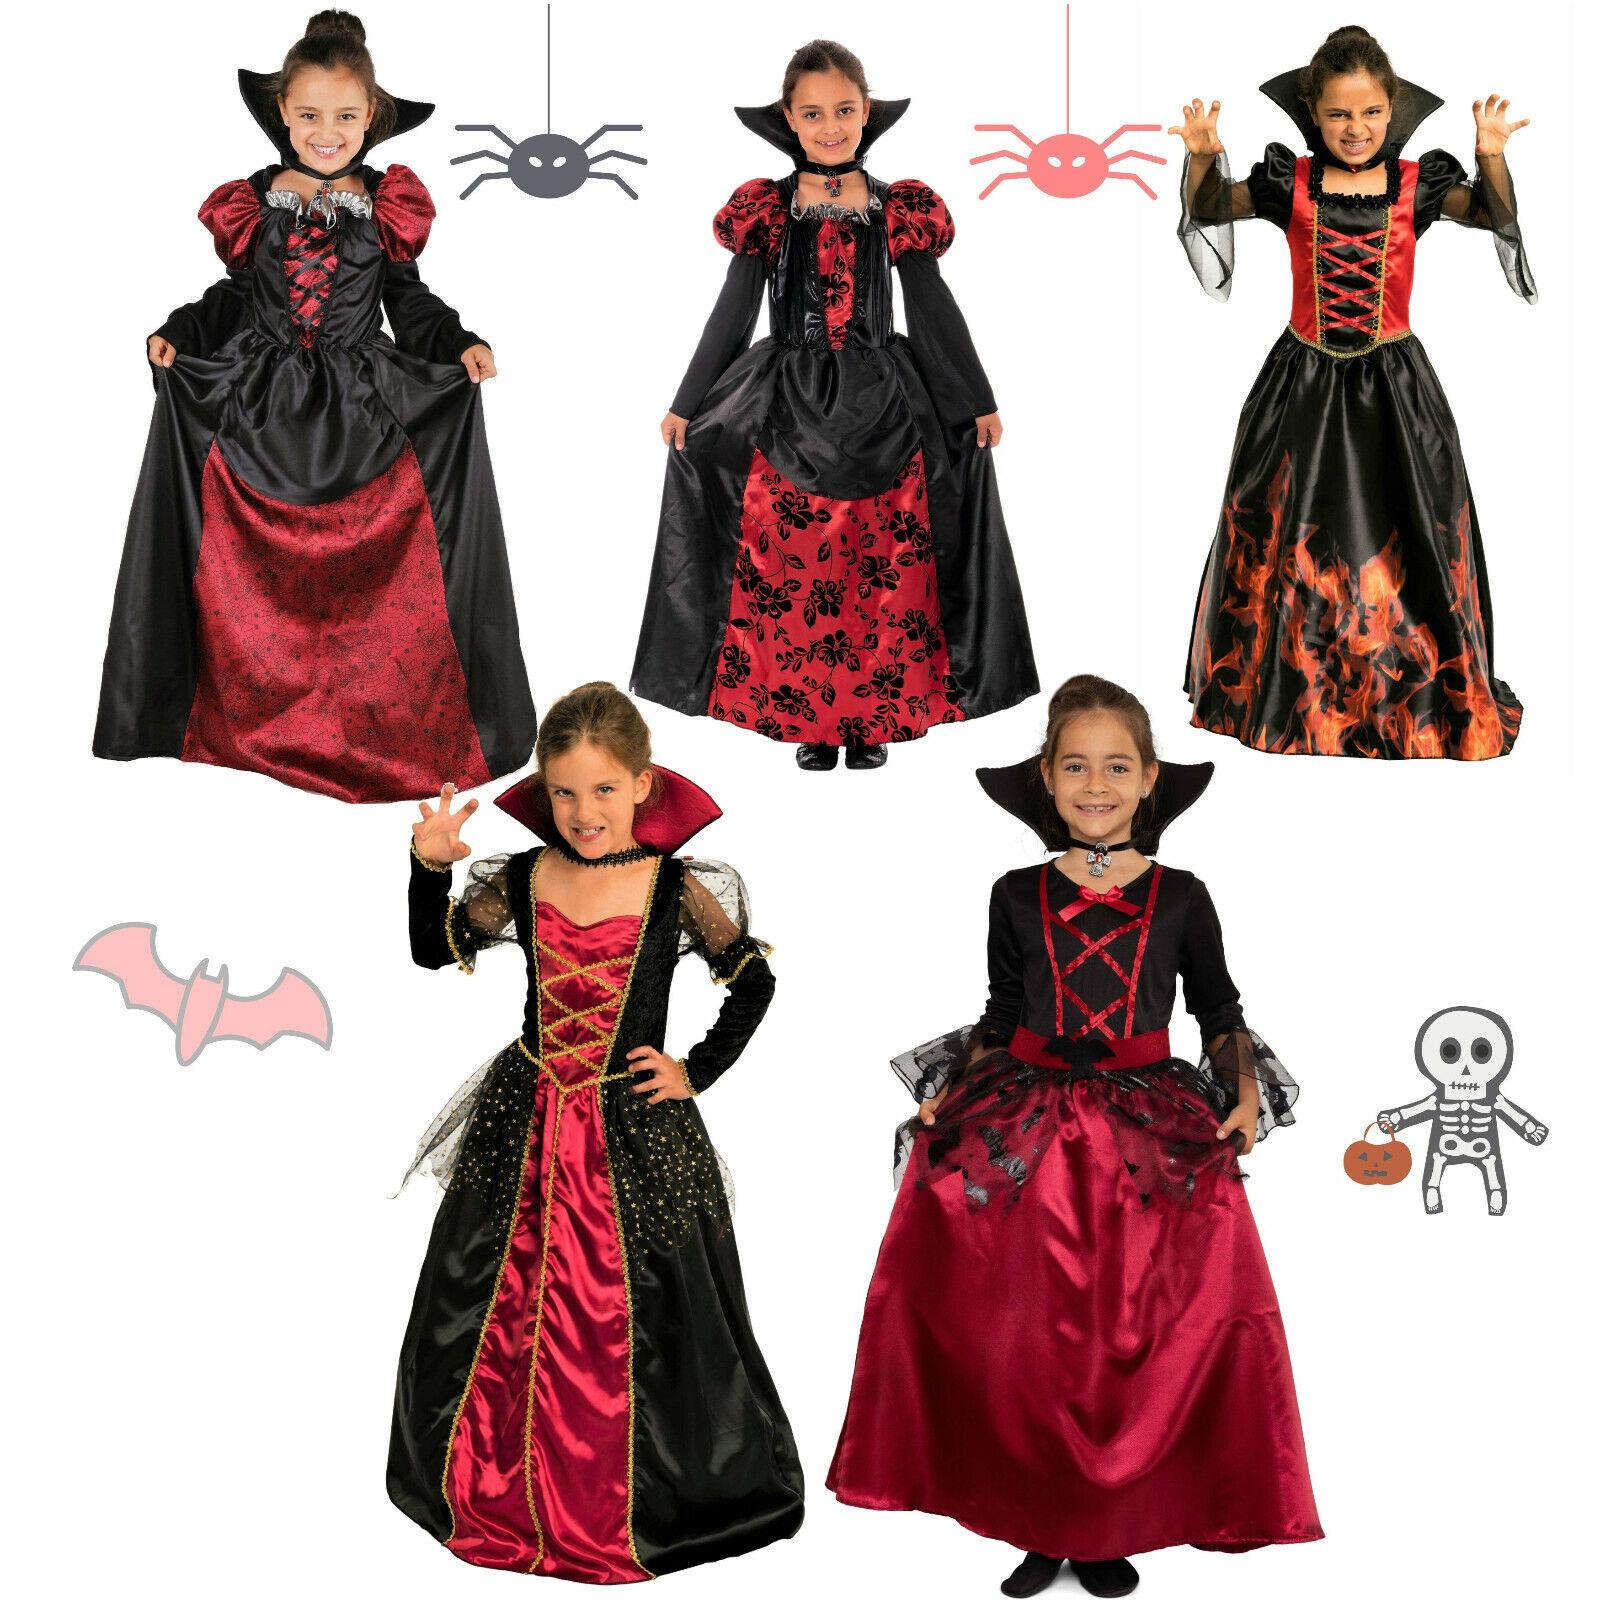 Vampir Halloween Kostüm Kinder Mädchen Halloweenkostüm Skelett Kind Fasching rot